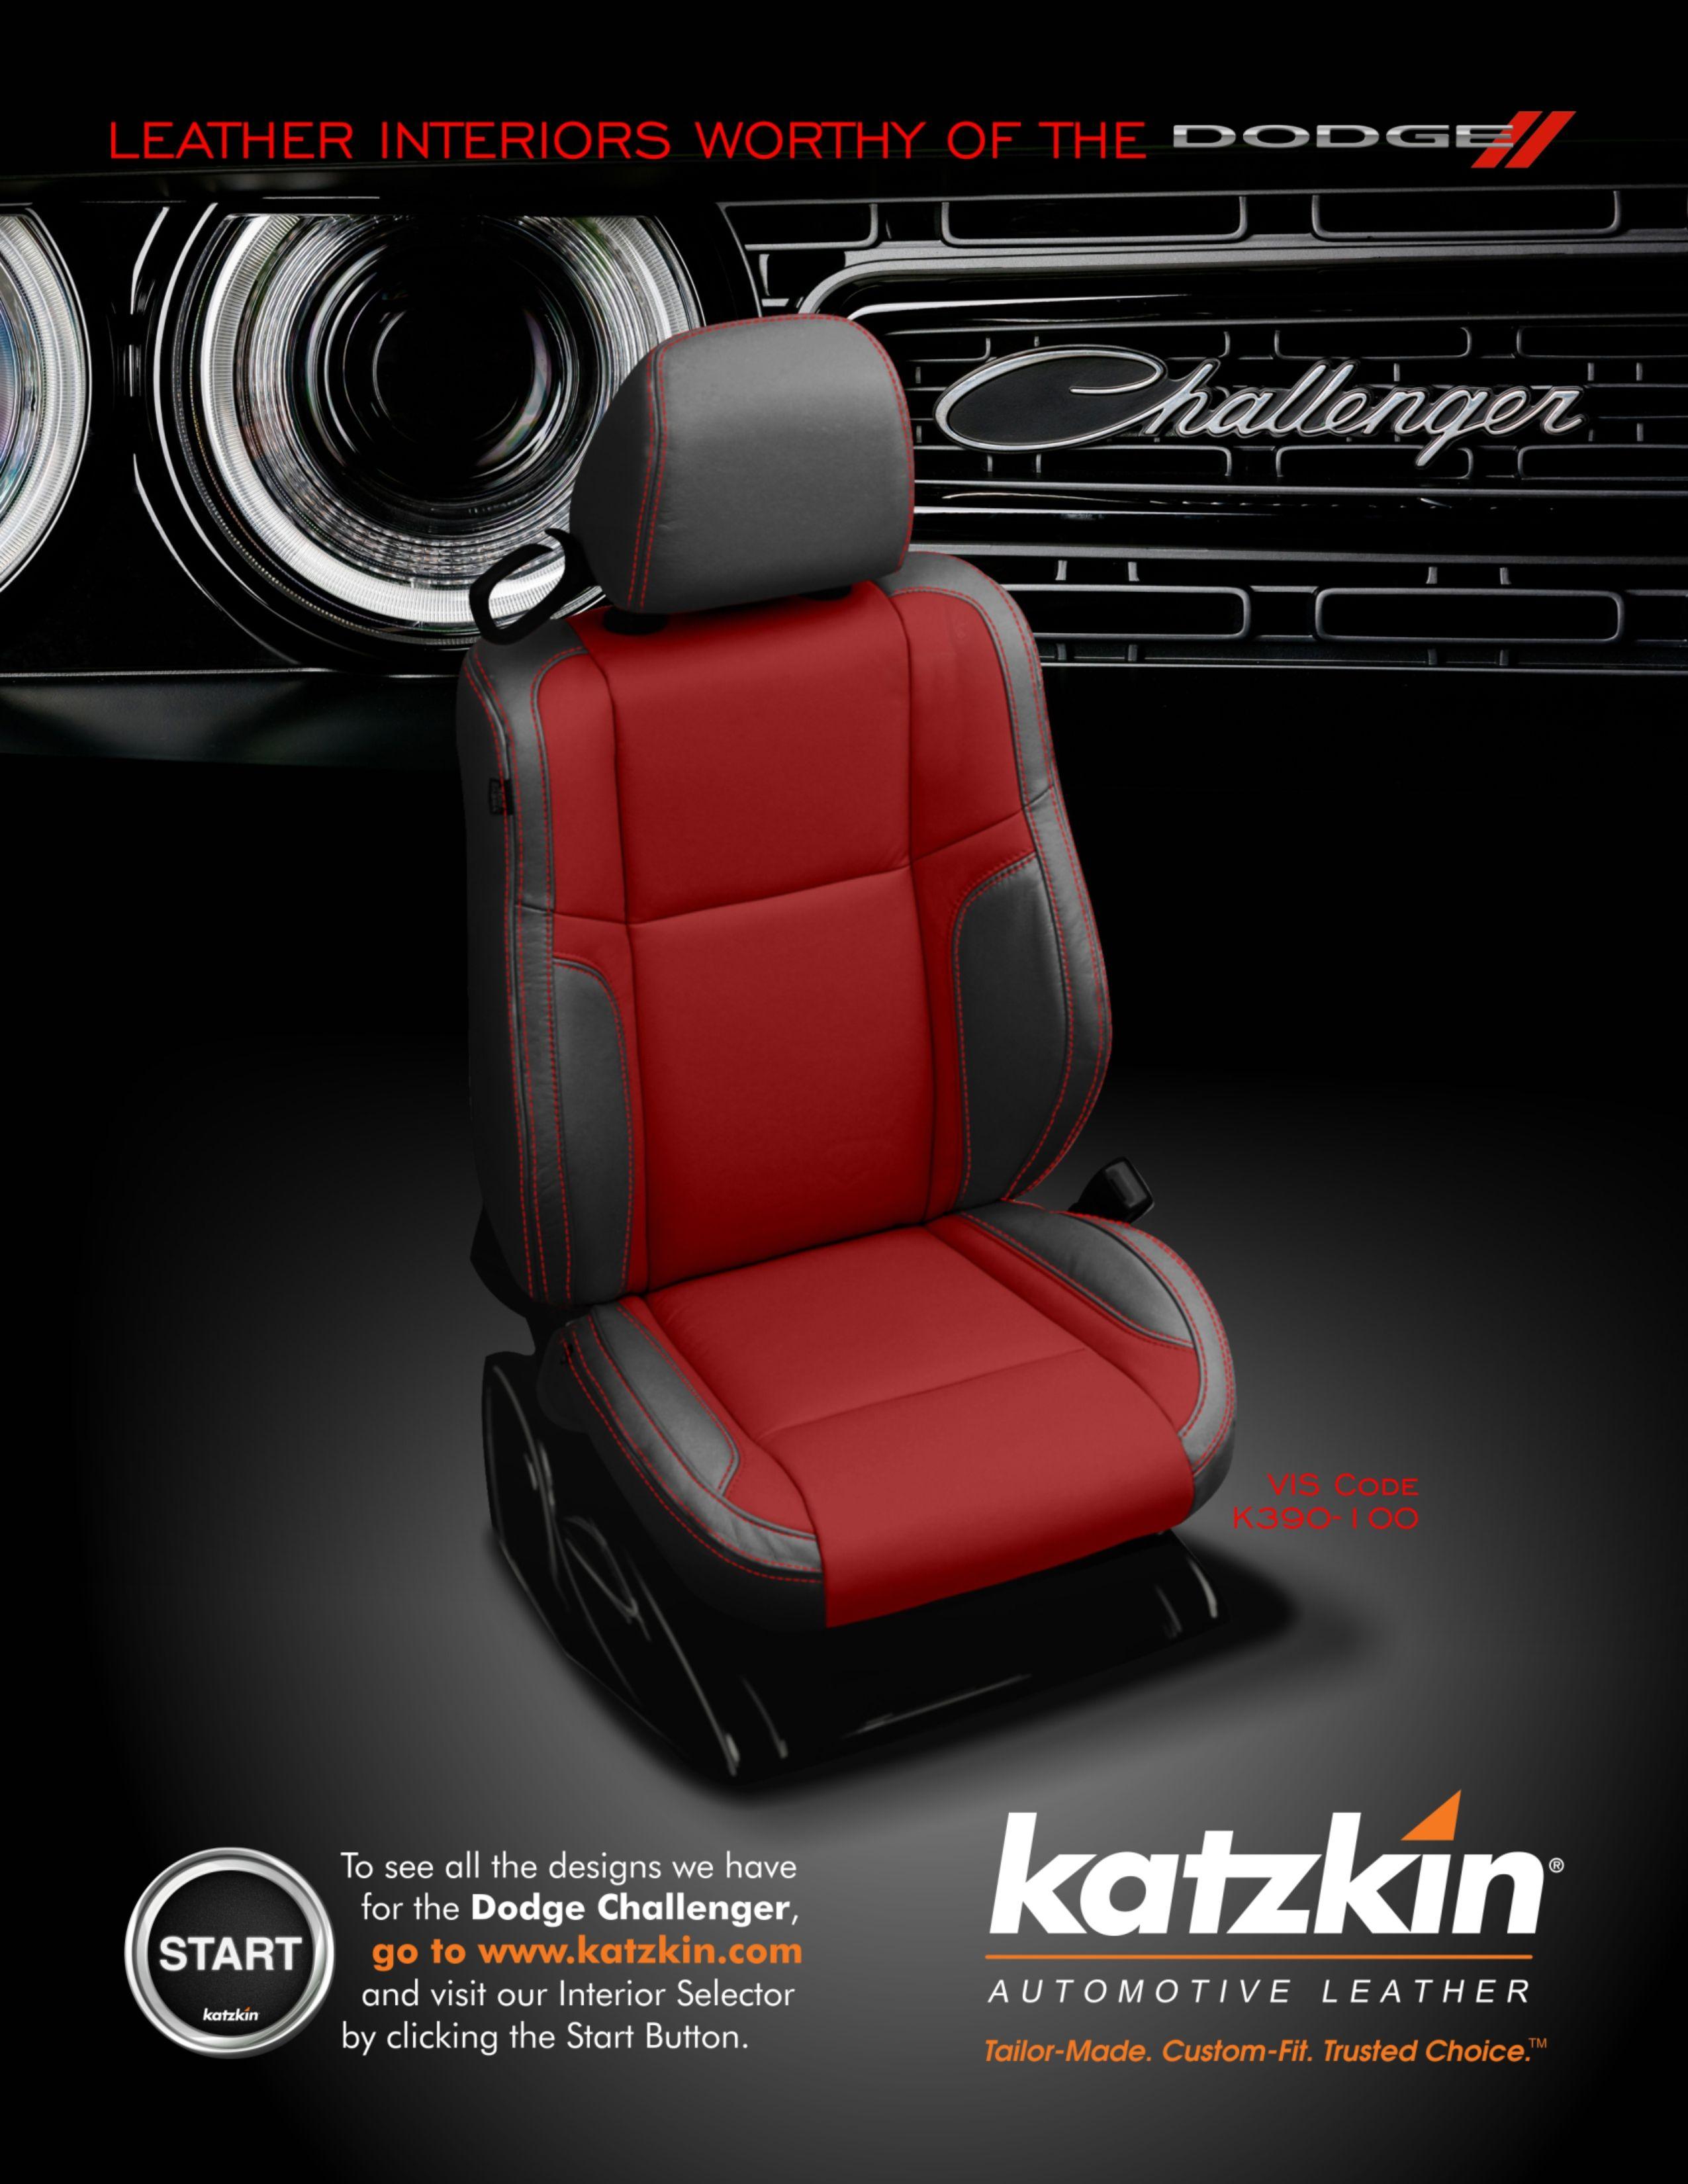 2015 Dodge Challenger (E-Brochure)